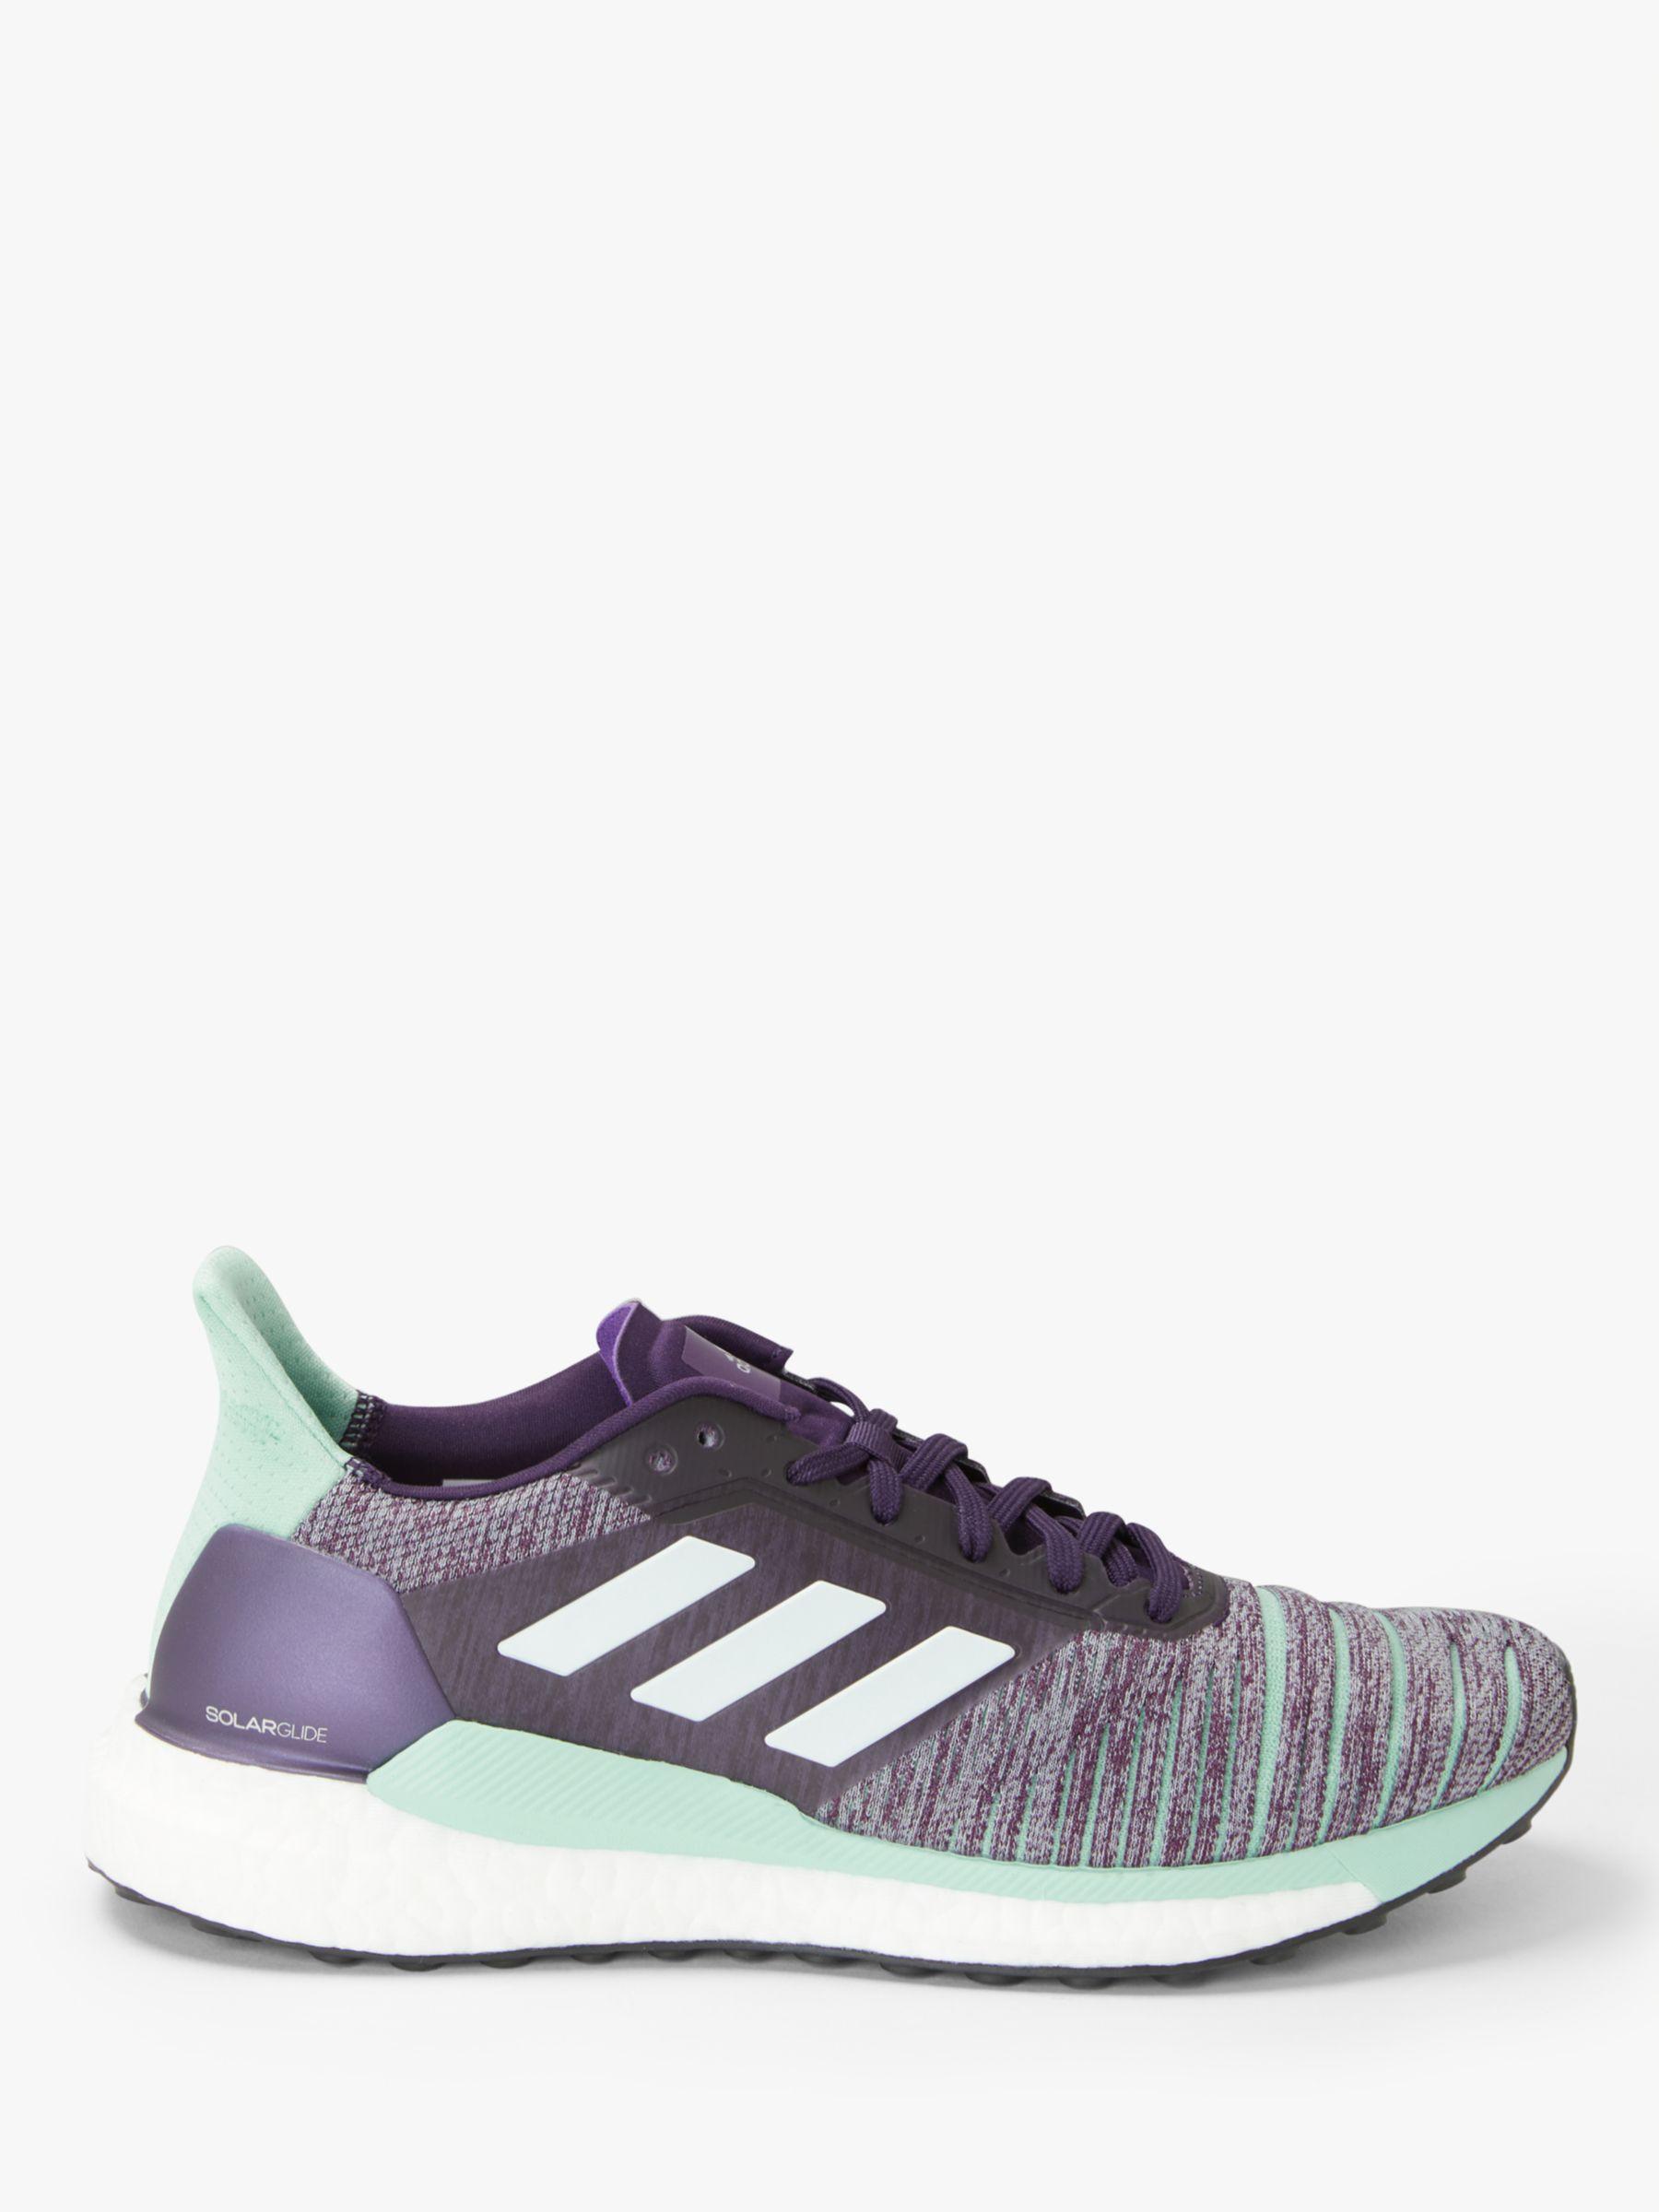 adidas Solar Glide Women's Running Shoes, Legend PurpleFTWR